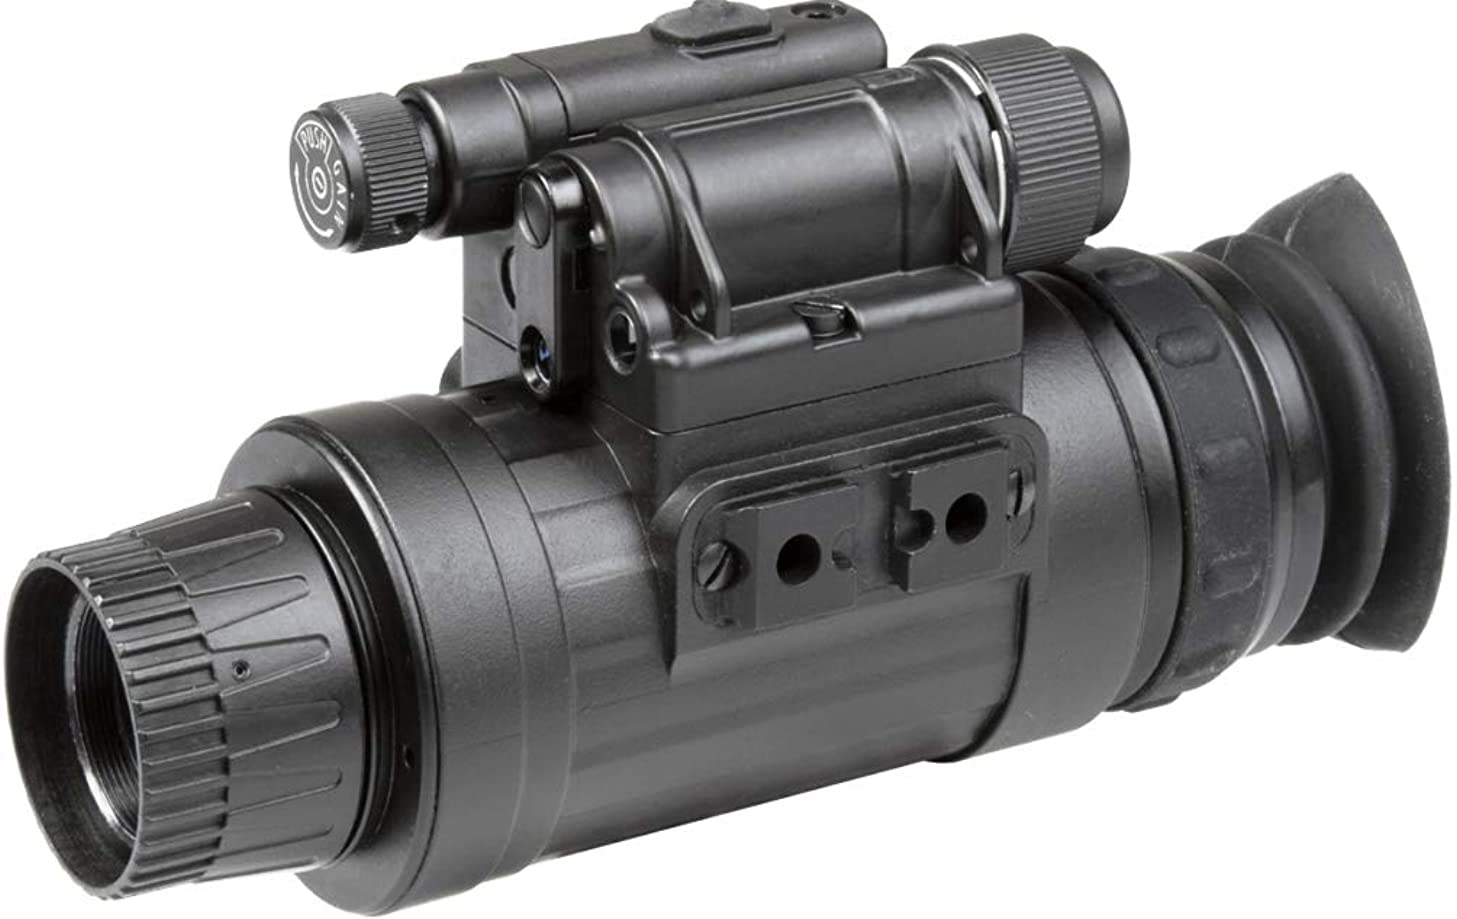 PRG Defense 11W14122103031 Model Wolf-14 NL3 Mul-Purpose Night Vision Monocular, Gen 2+